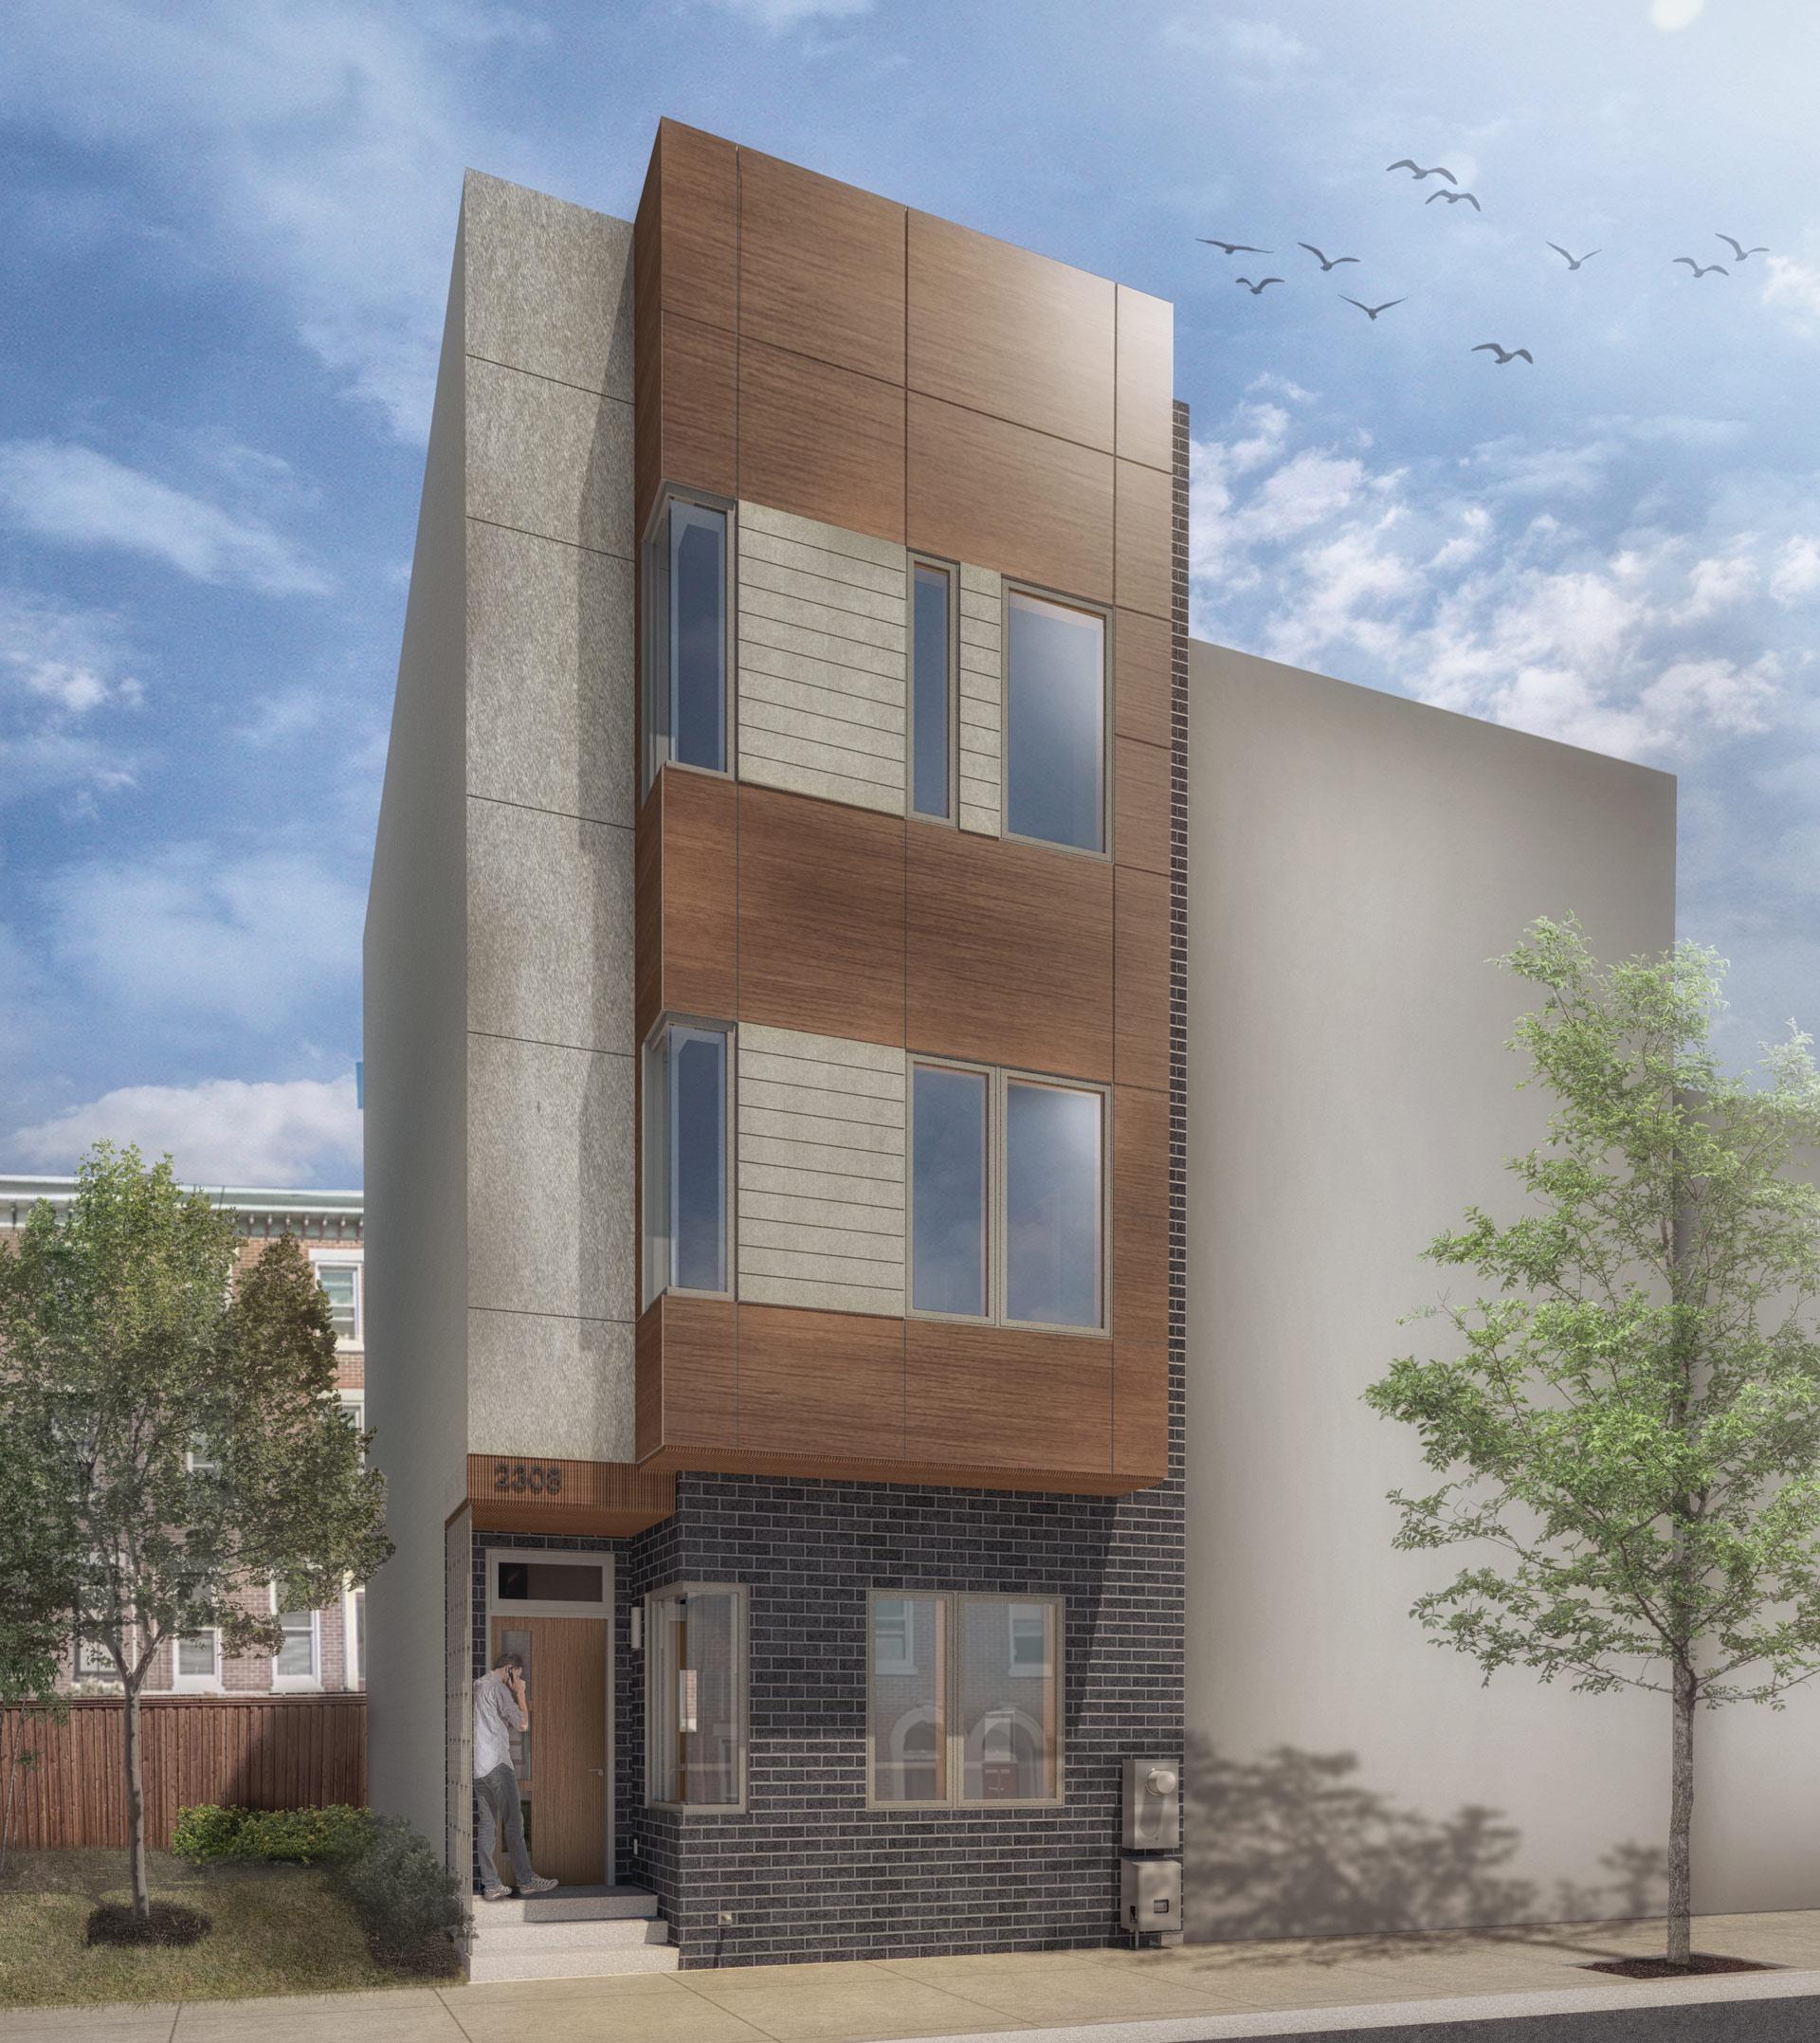 New Construction Single Family Home Philadelphia